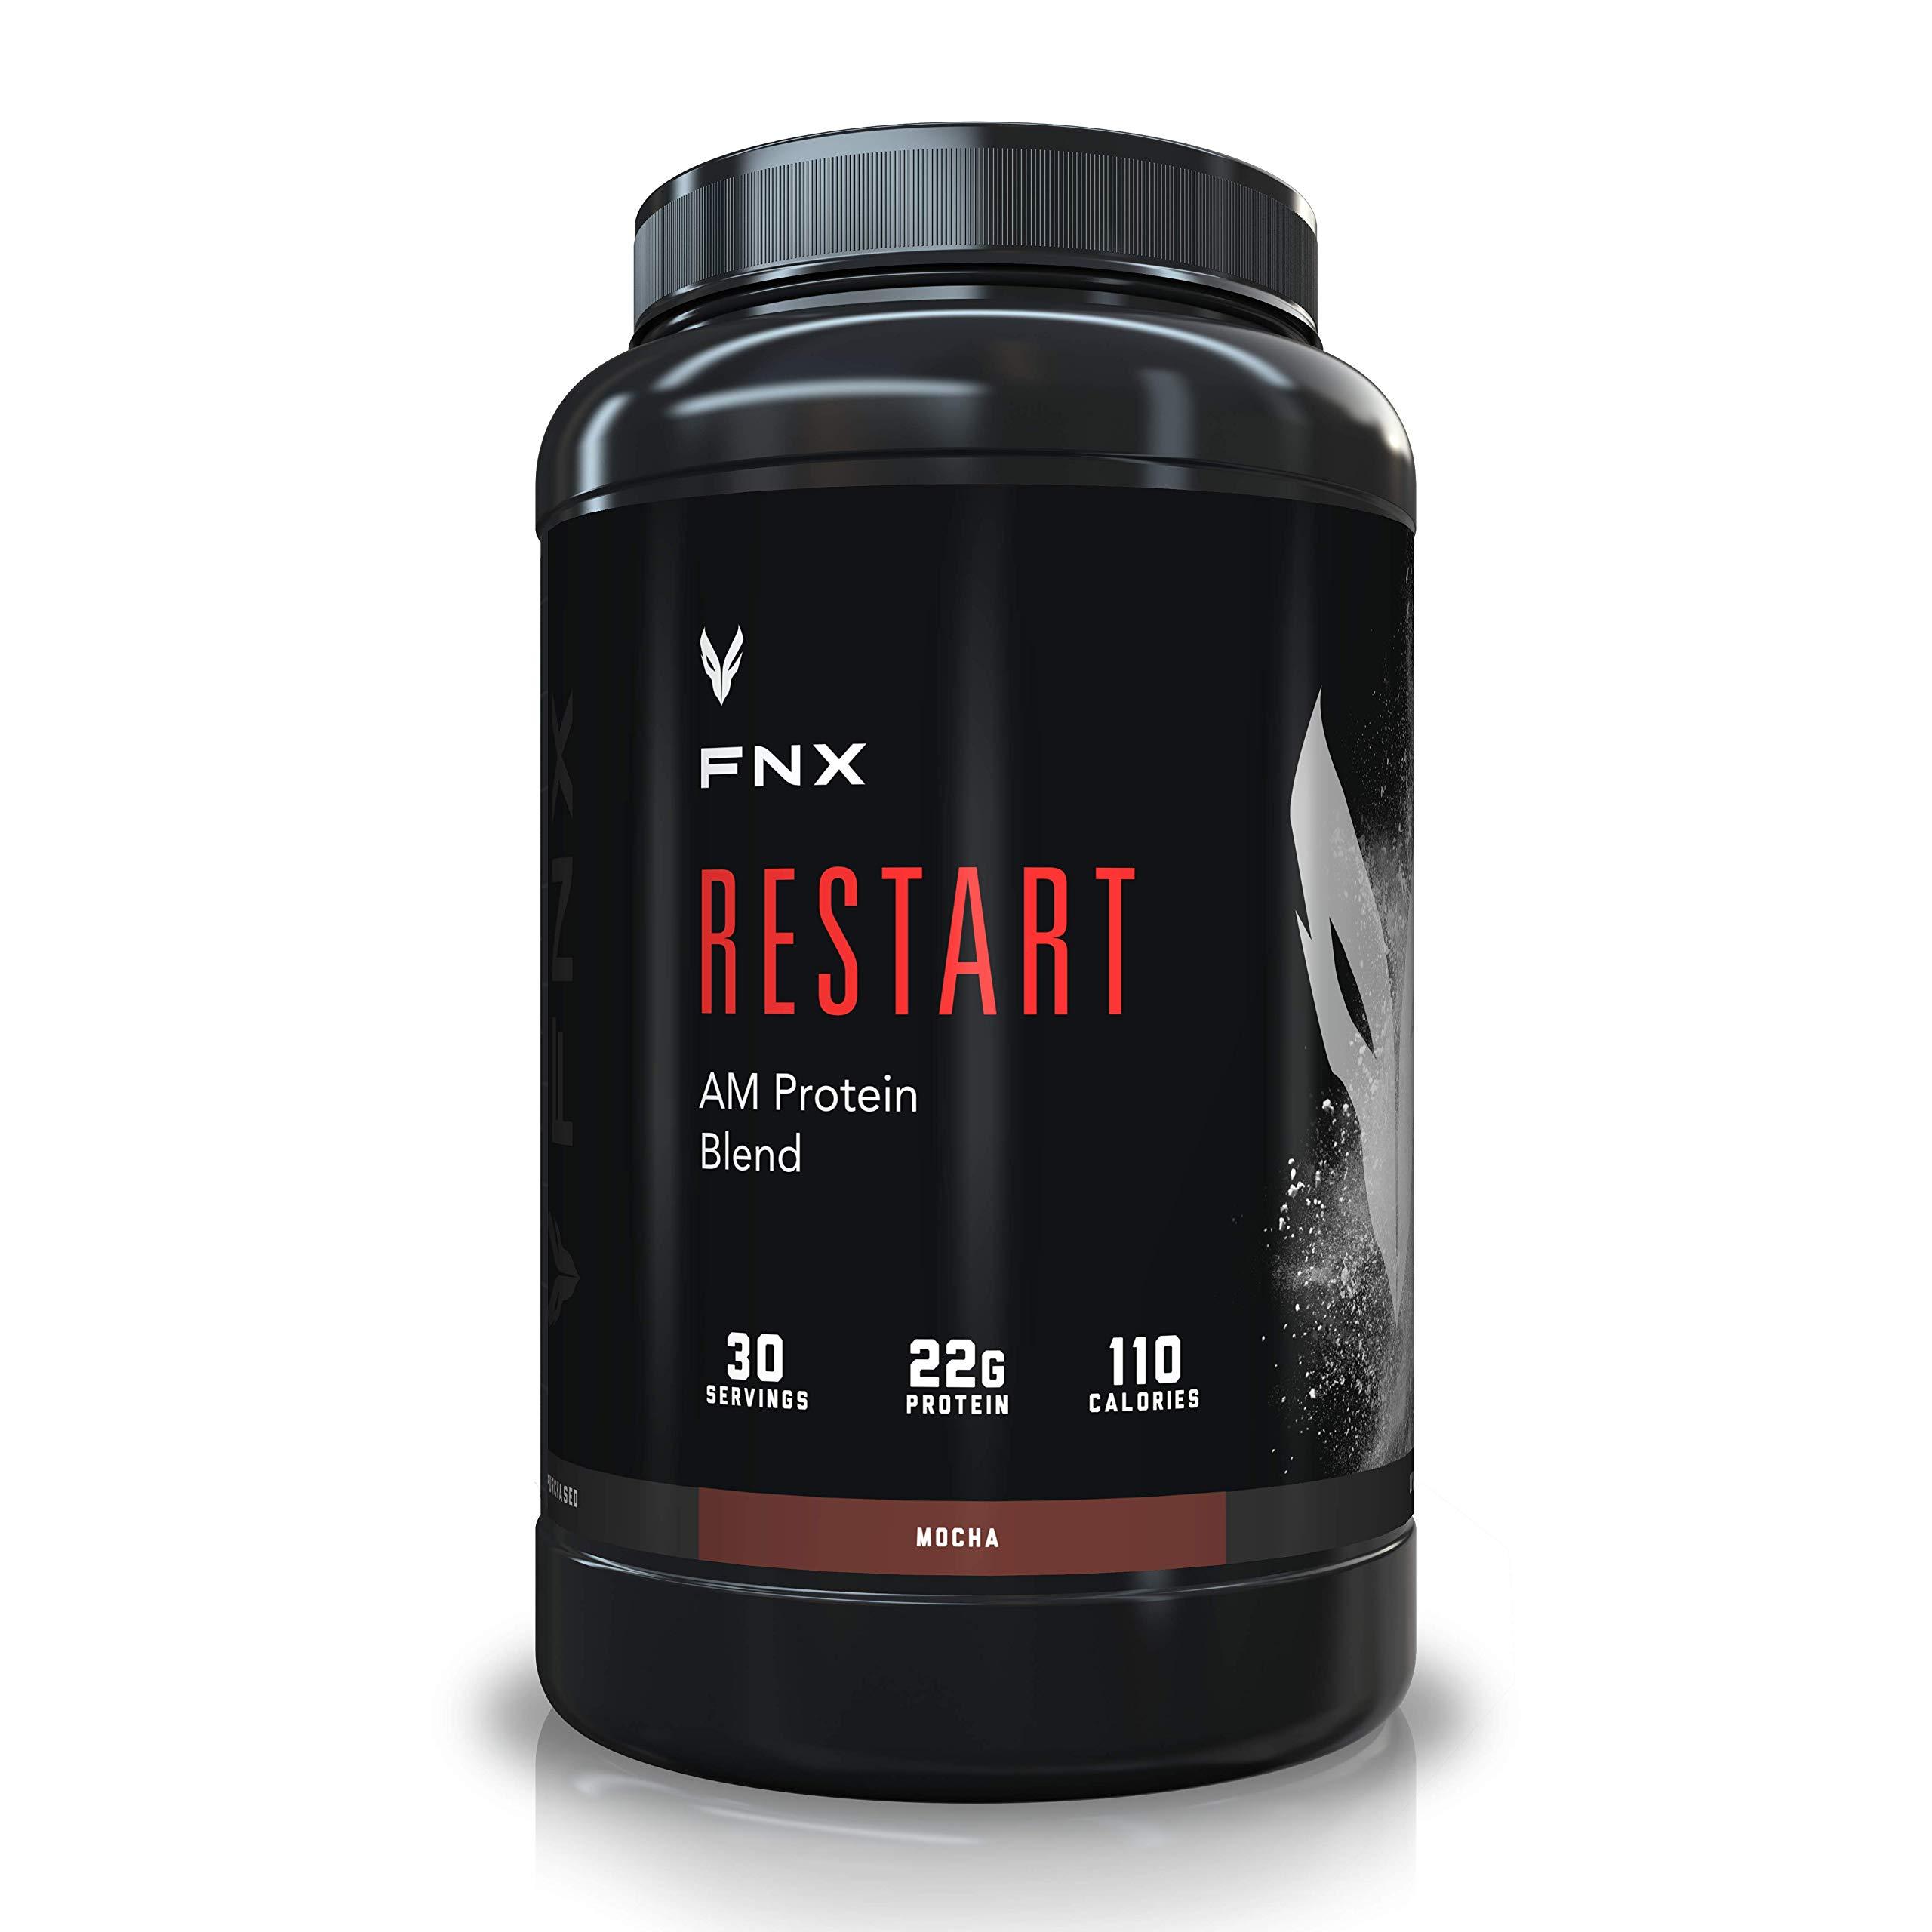 FNX Restart AM Protein Blend (Mocha)